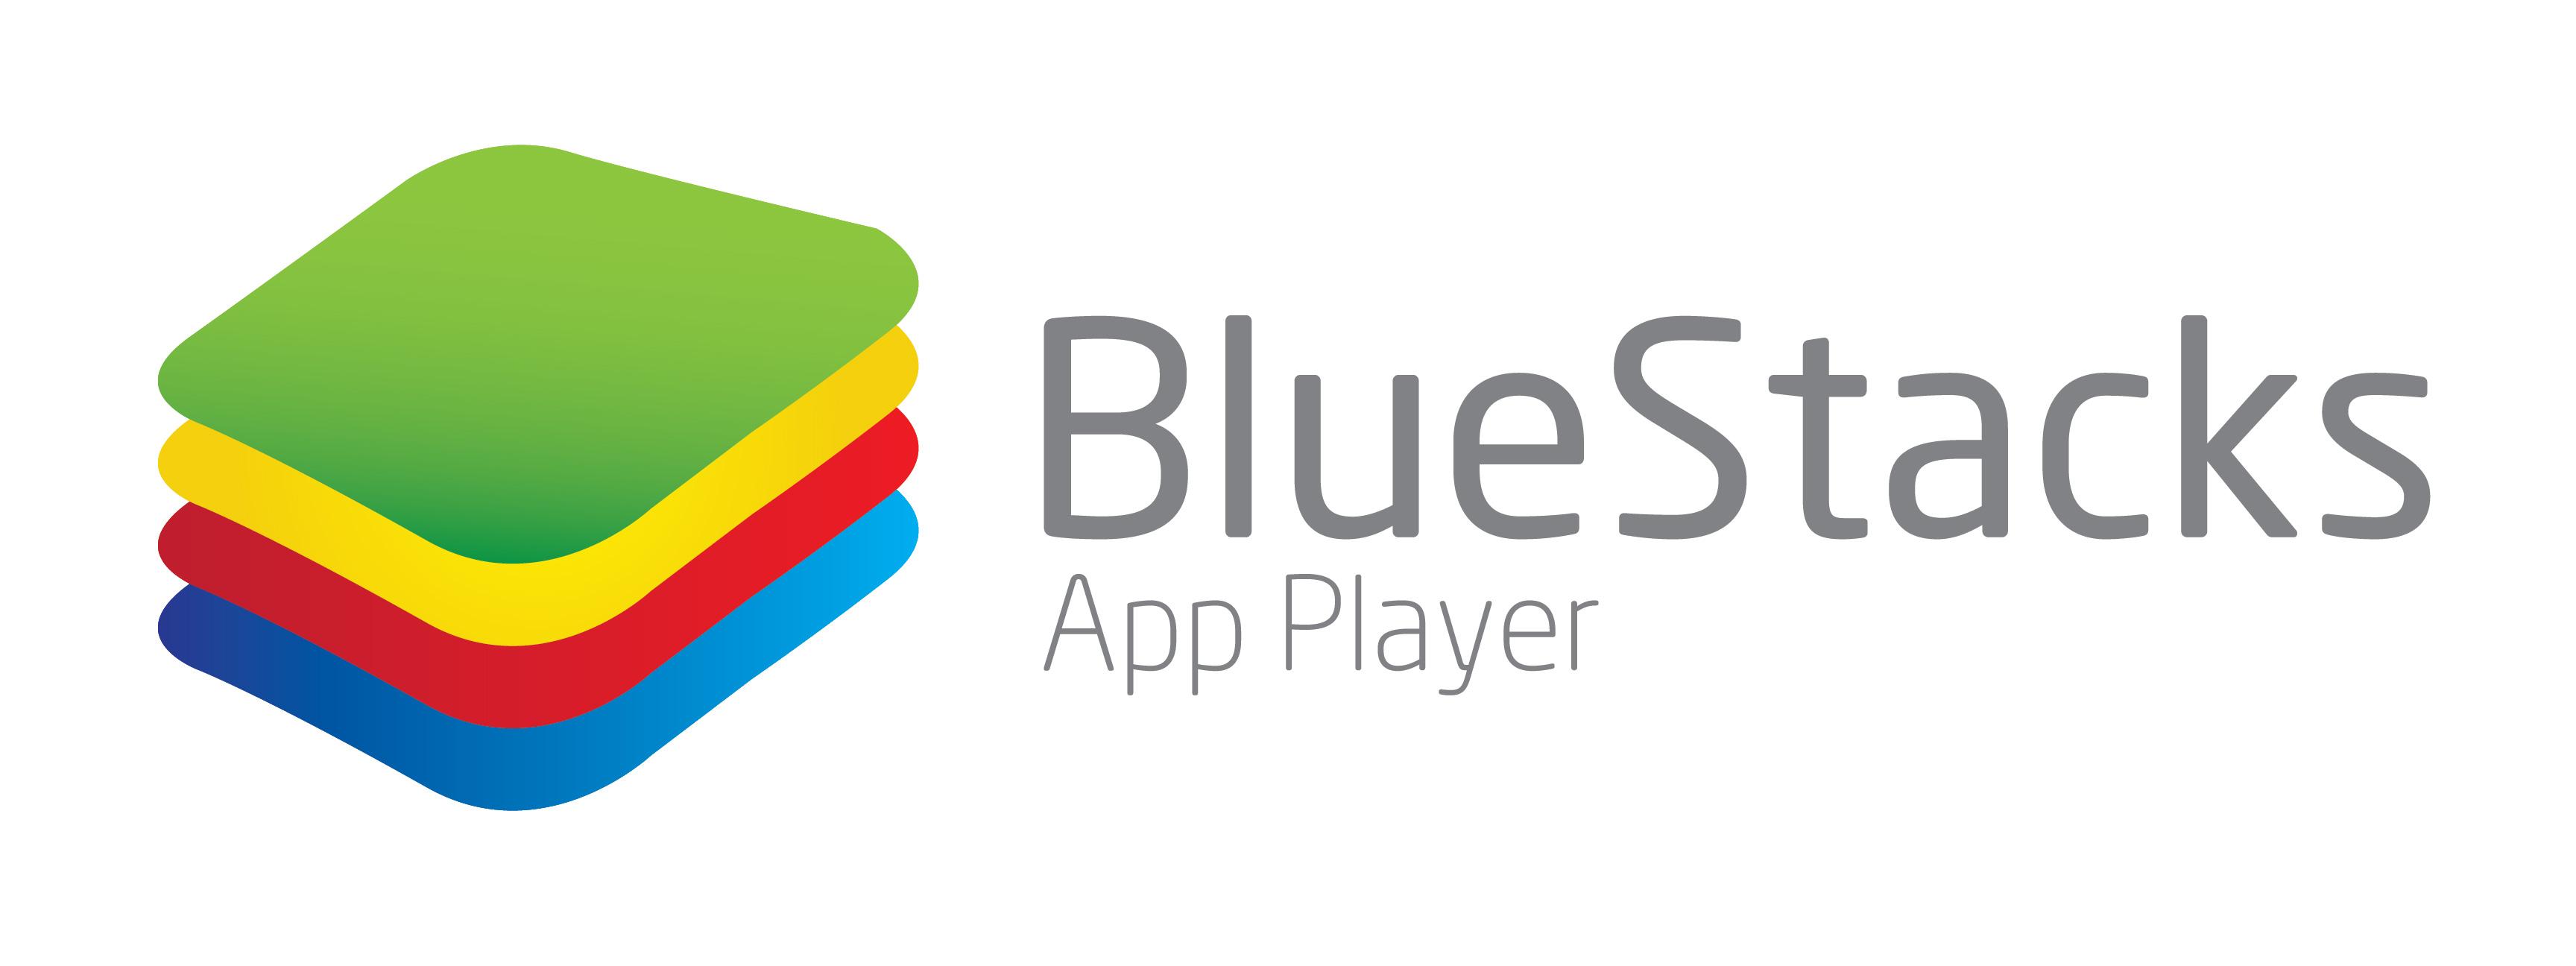 bluestacks-logo